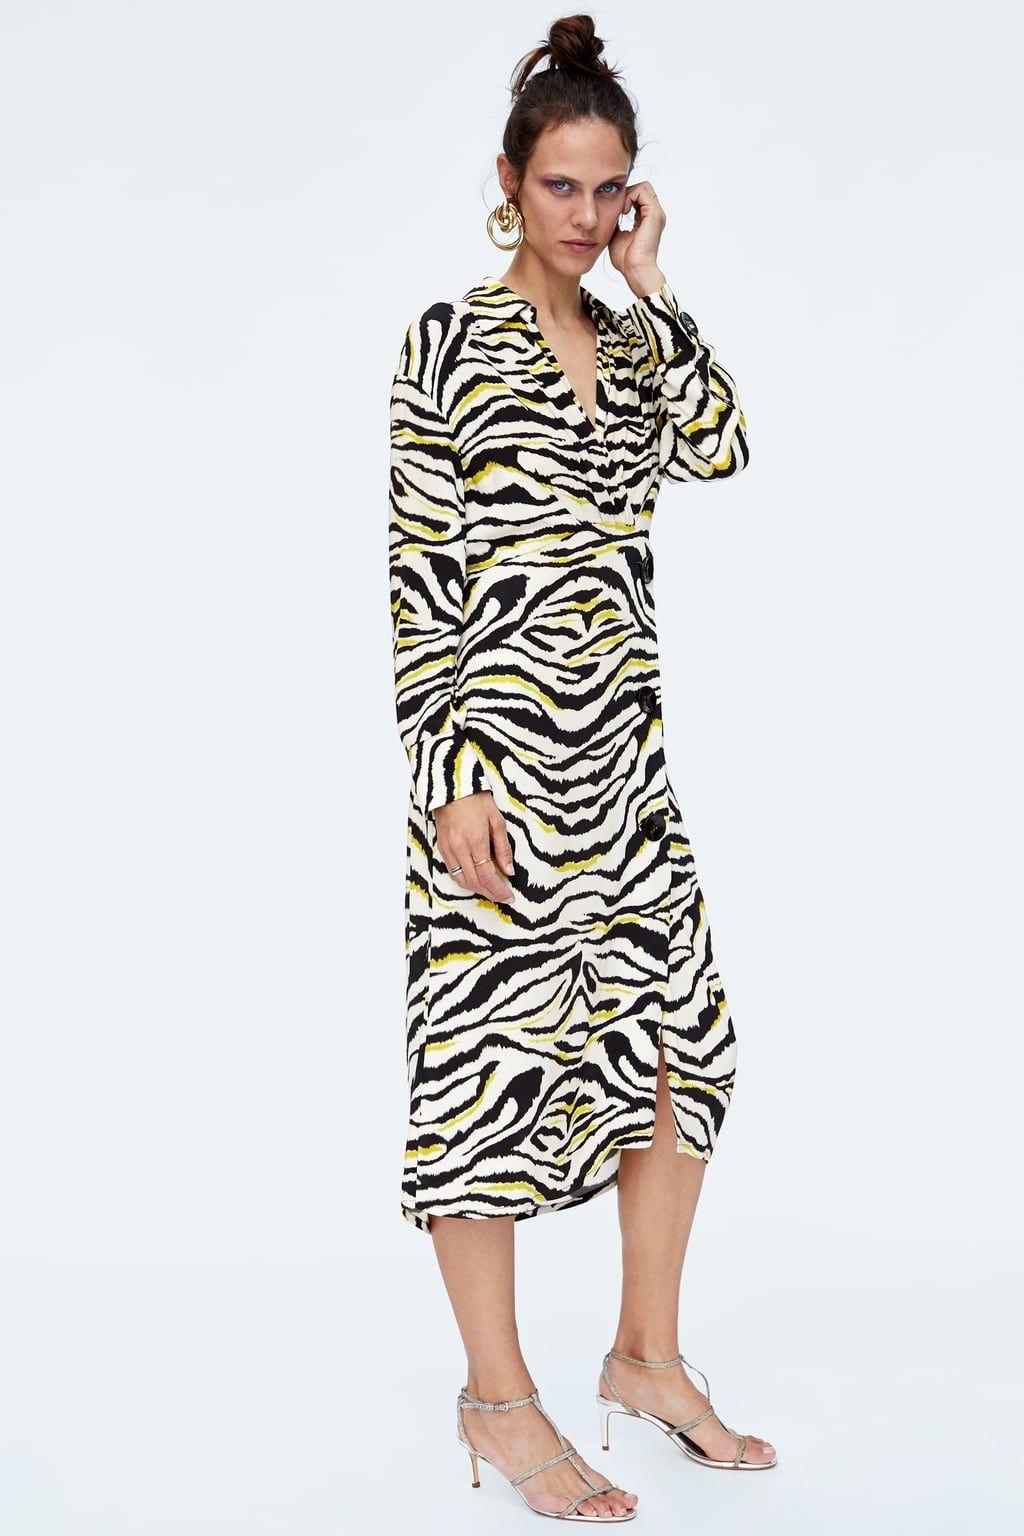 e0afbda8e125 Image 1 of ZEBRA PRINTED DRESS from Zara | Shopping | Midi shirt ...